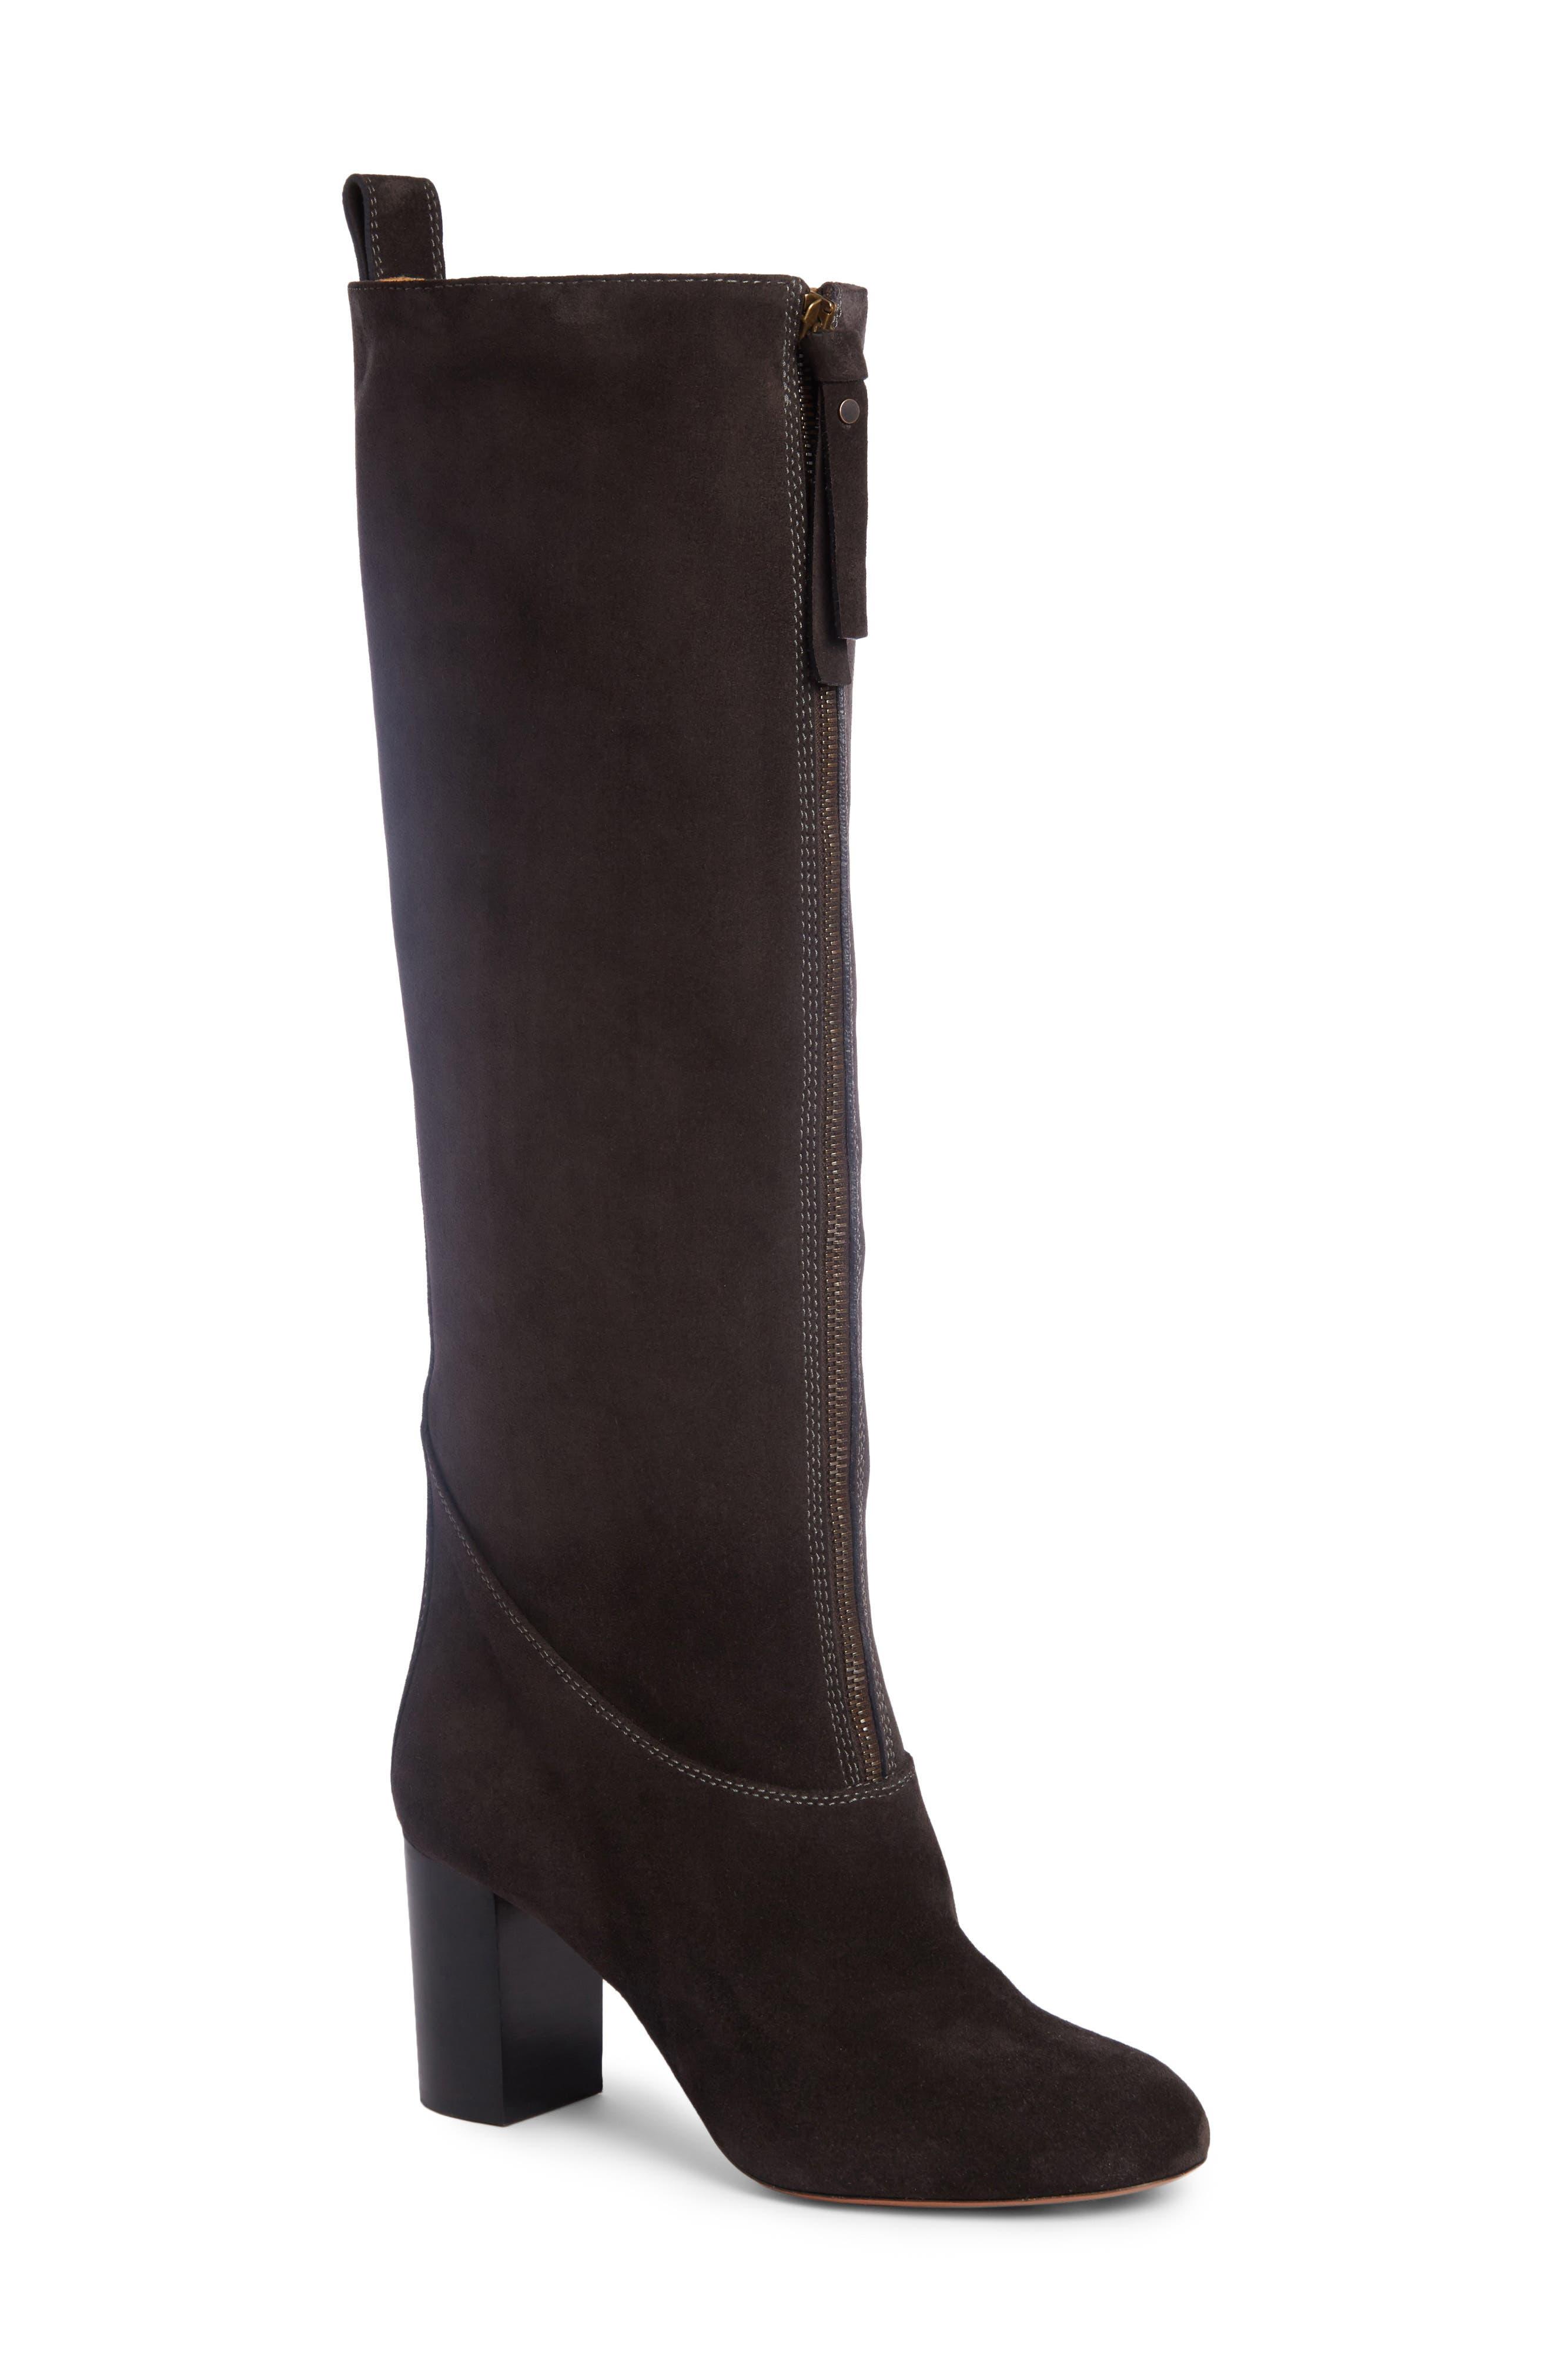 Paisley Front Zip Boot,                             Main thumbnail 1, color,                             Charcoal Black Suede